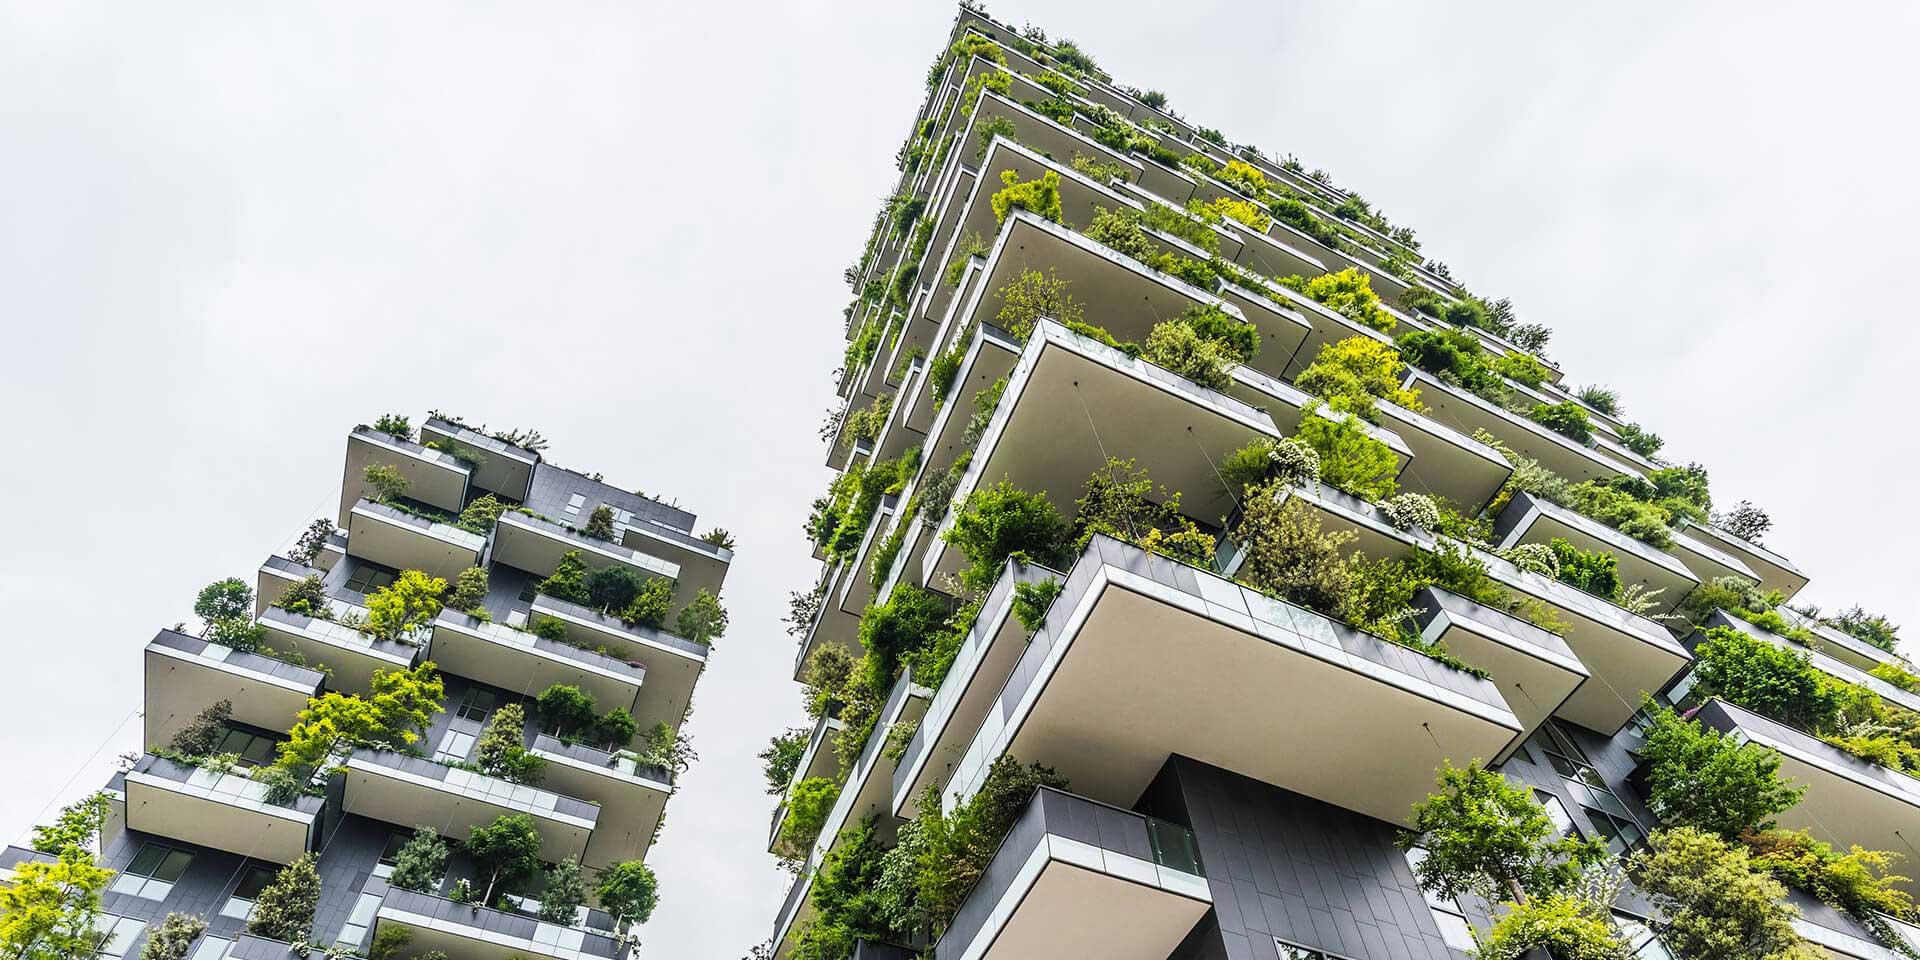 house-design-build-green-building-5